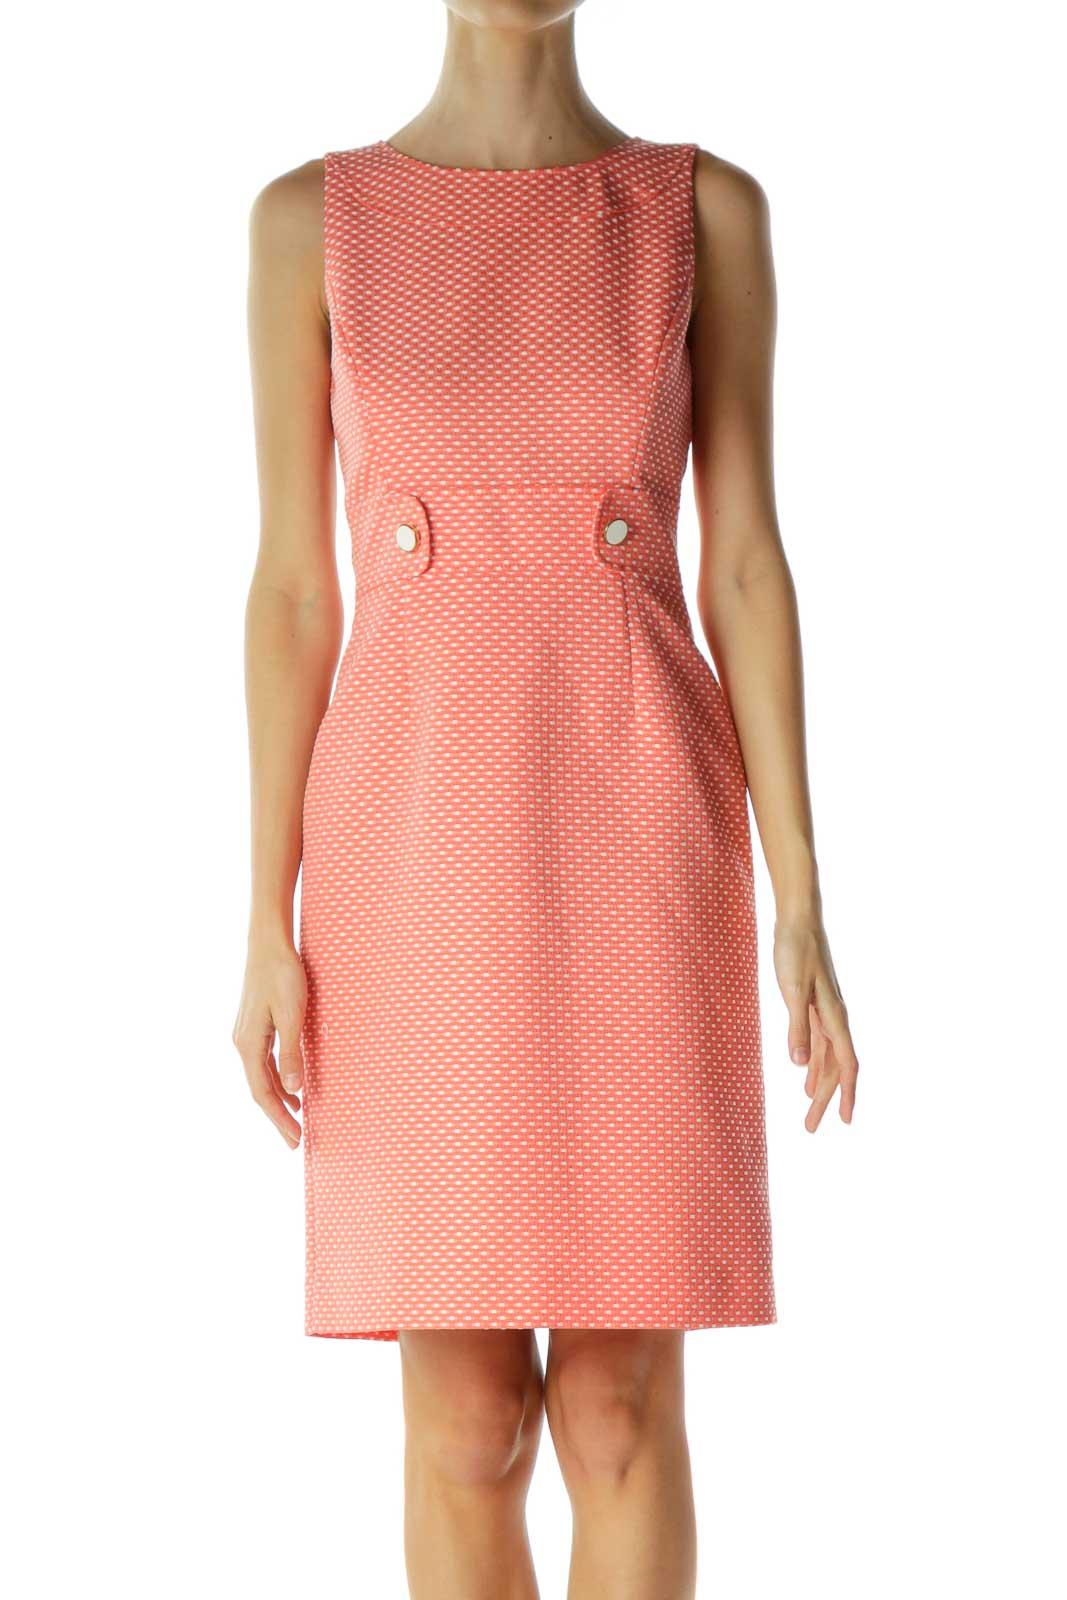 Orange White Stitch Print Work Dress